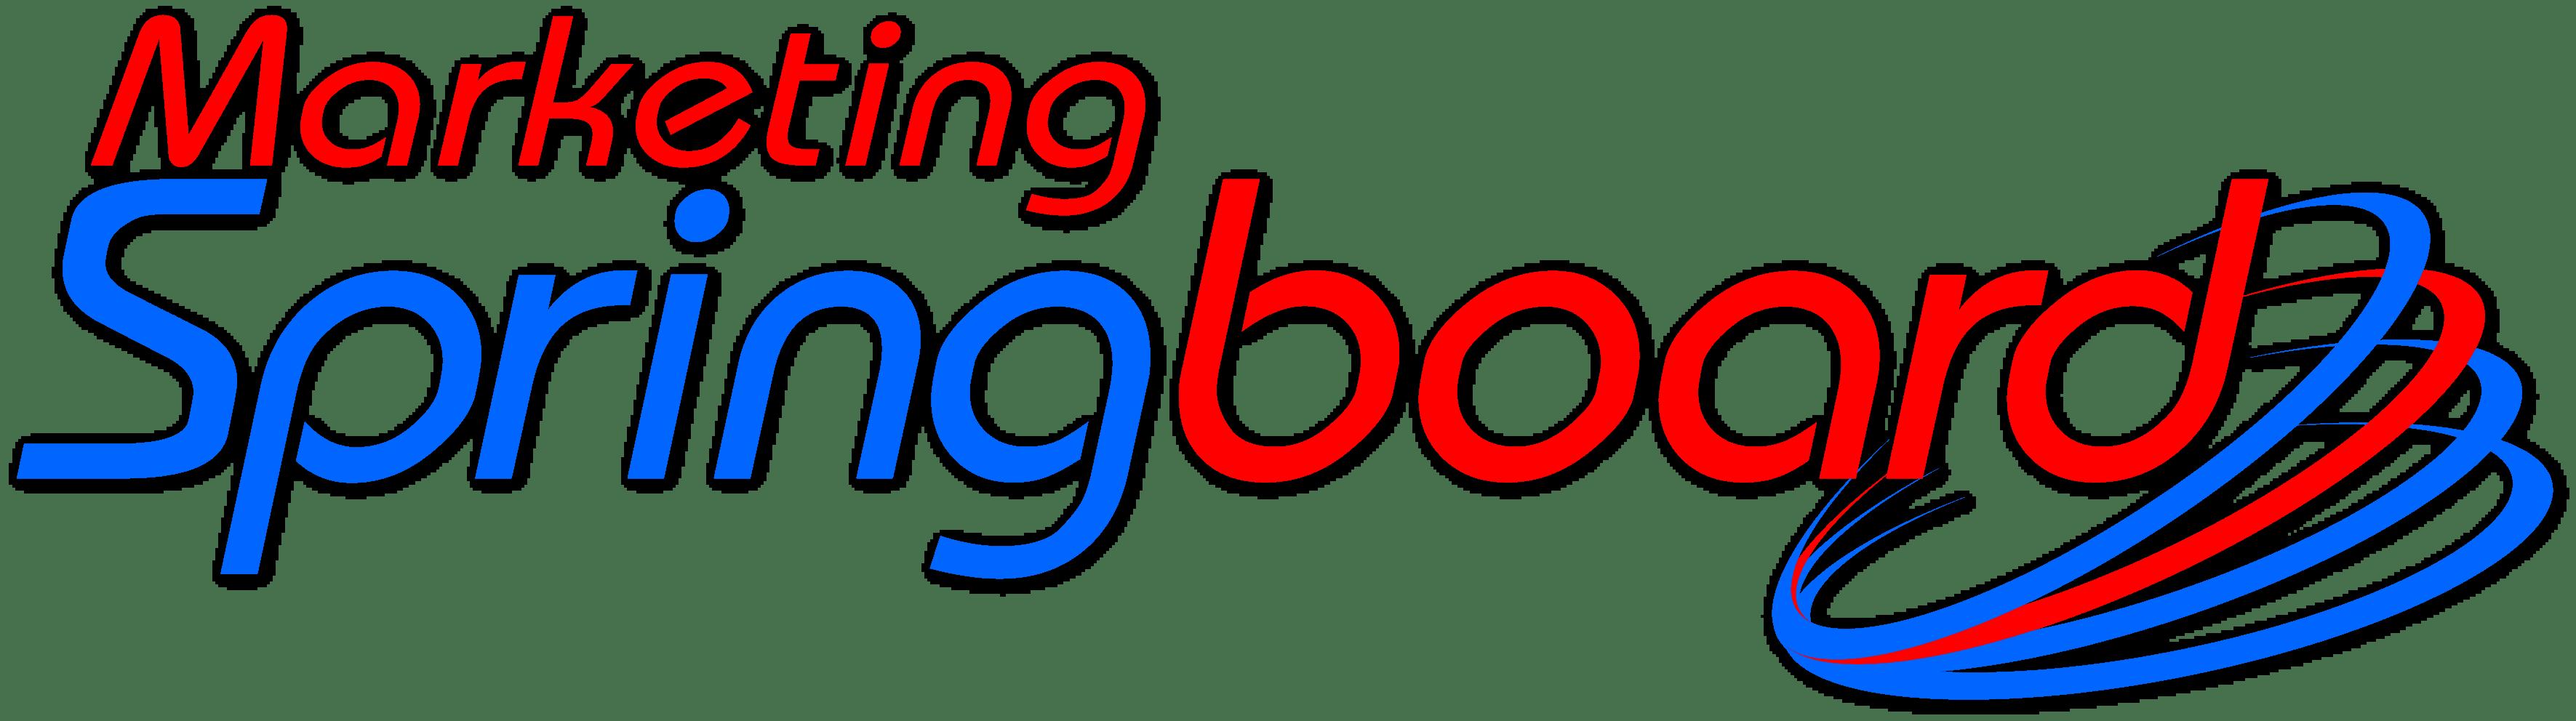 Marketing_Springboard